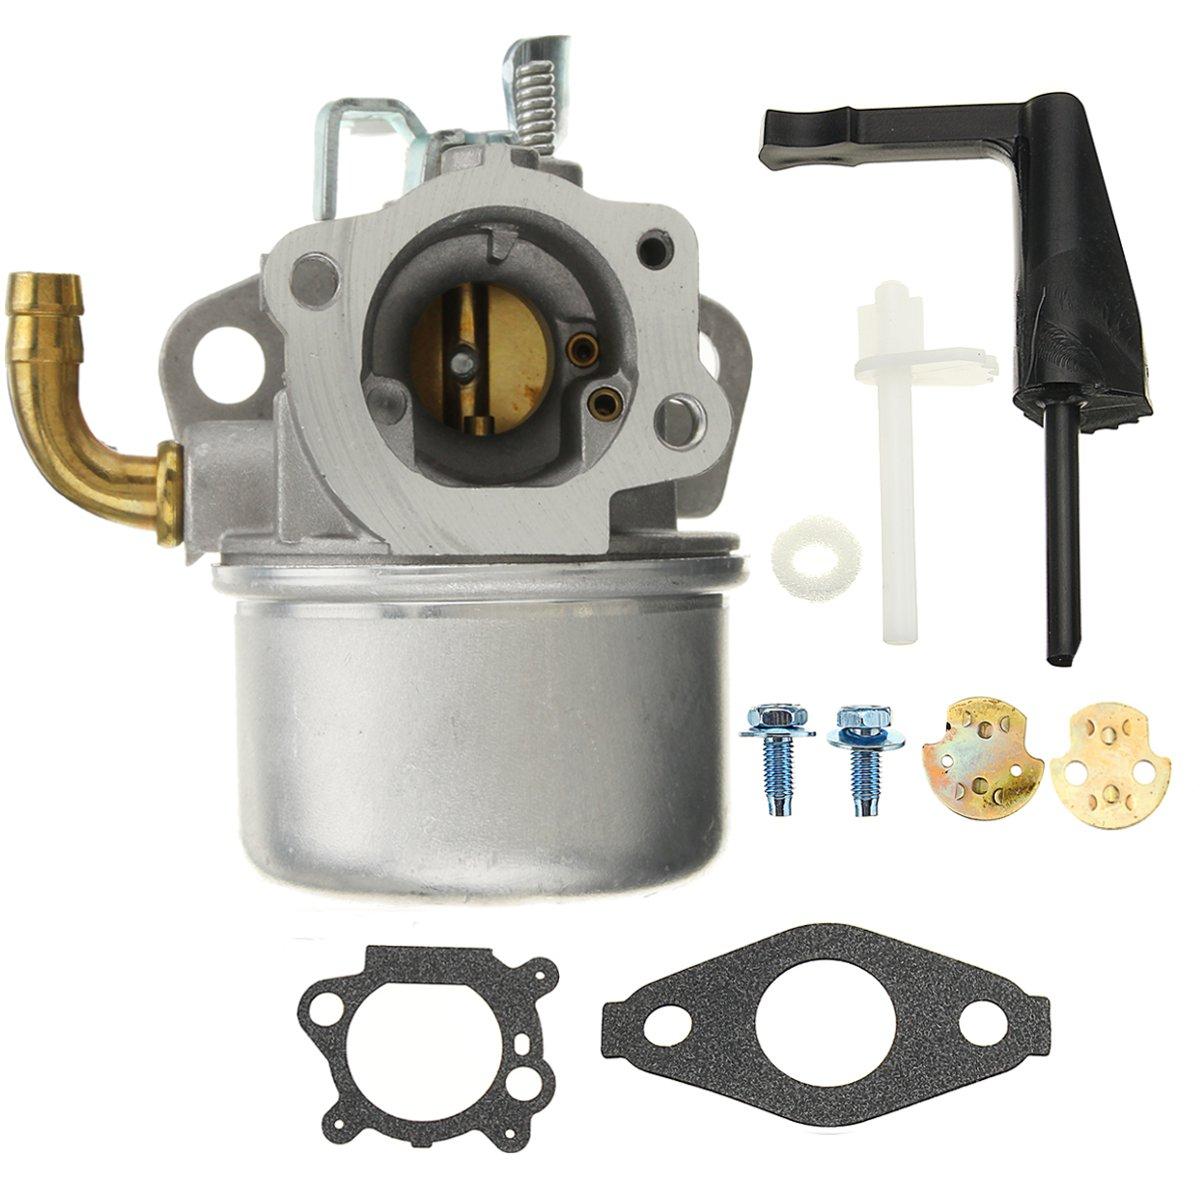 Carburetor Kit Replace 791077 696981 698860 790182 For Briggs & Stratton 190 6HP 206cc 5.5hp EngineCarburetor Kit Replace 791077 696981 698860 790182 For Briggs & Stratton 190 6HP 206cc 5.5hp Engine